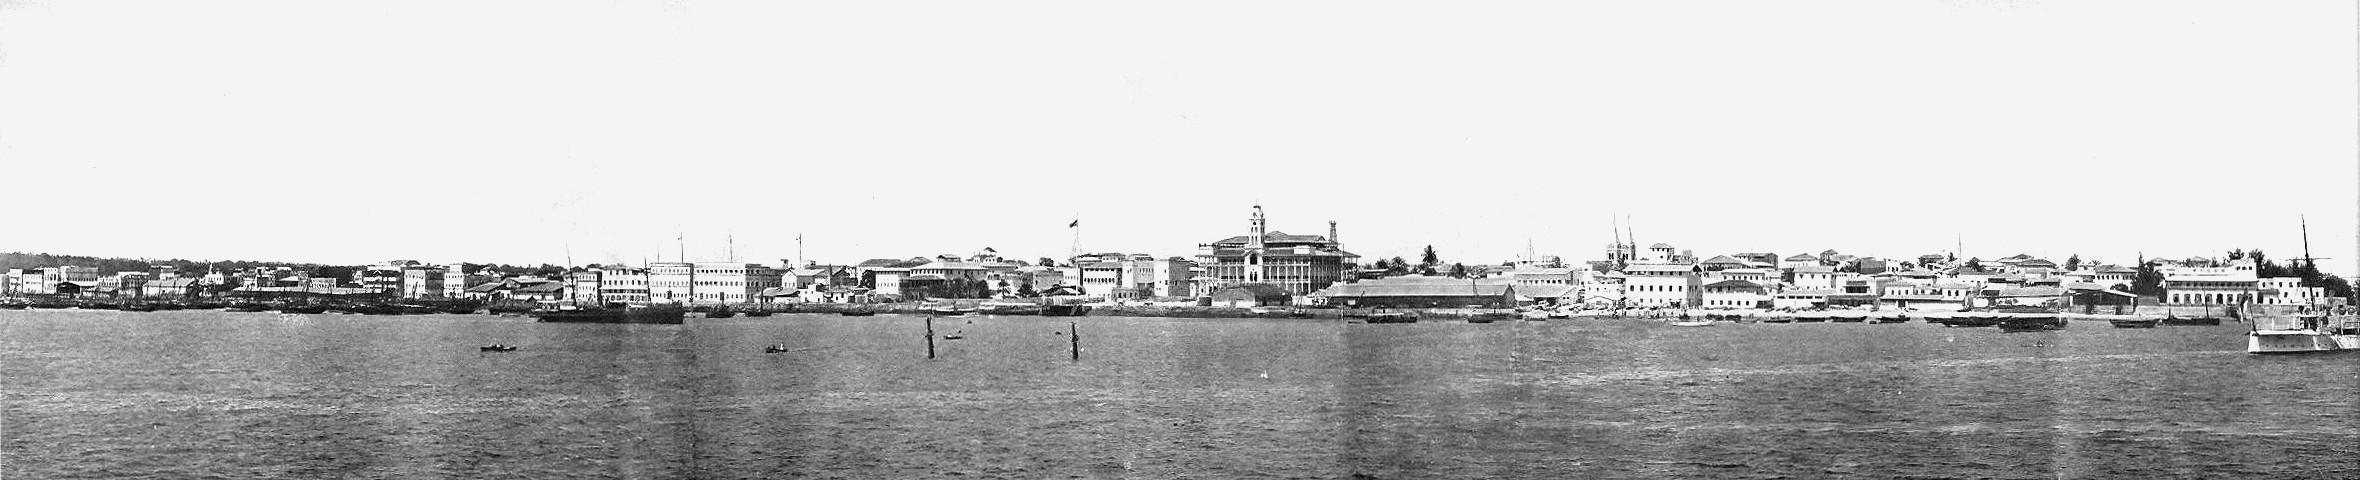 http://upload.wikimedia.org/wikipedia/commons/e/ef/A._C._Gomes_Panorama_Zanzibar_1902.jpg